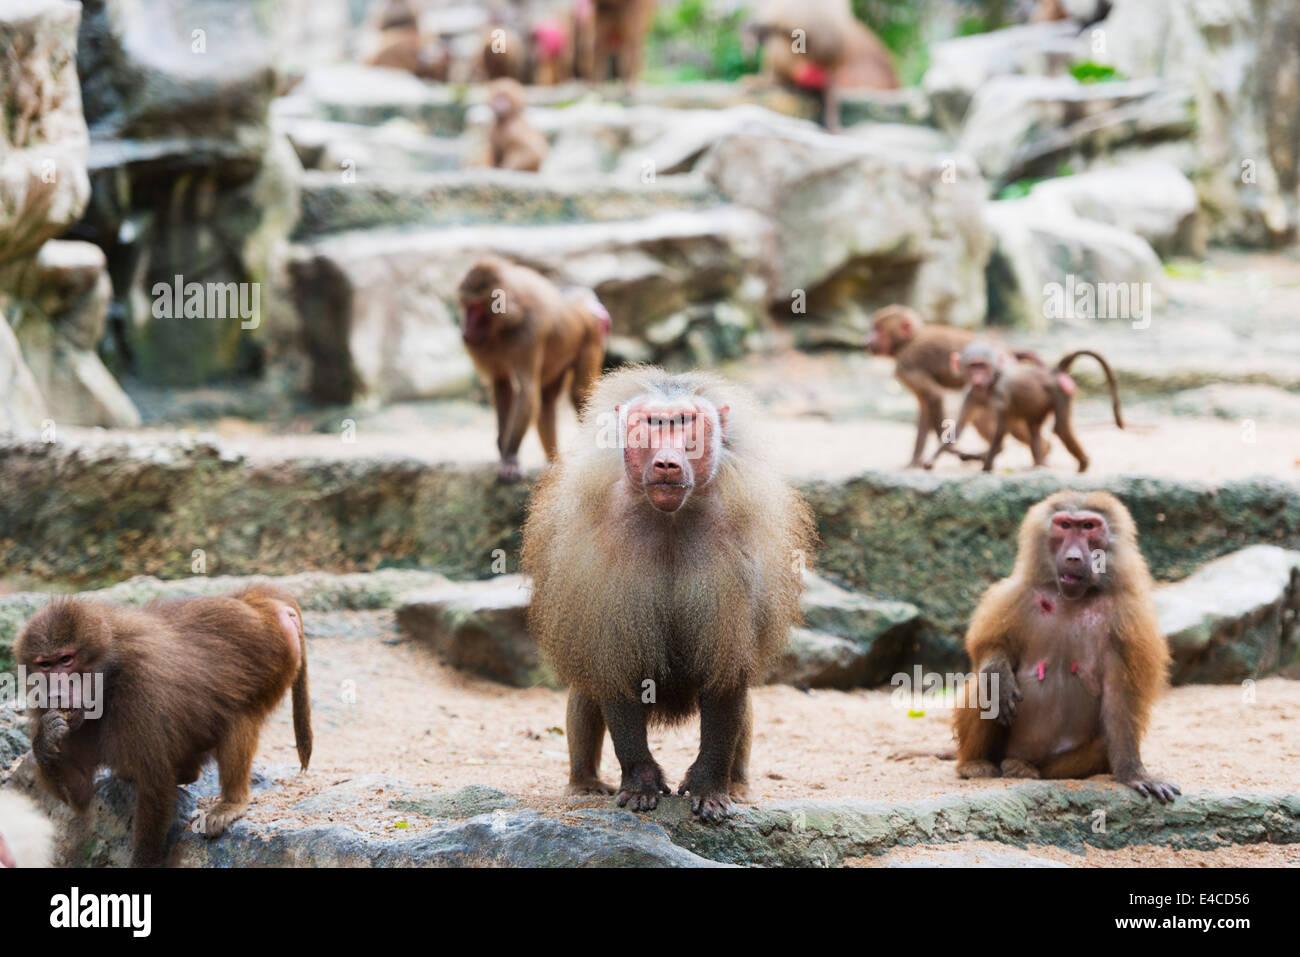 Sudeste asiático, Singapur, Singapur Zoo, etíope babuino, Gelada (Theropithecus gelada) Imagen De Stock